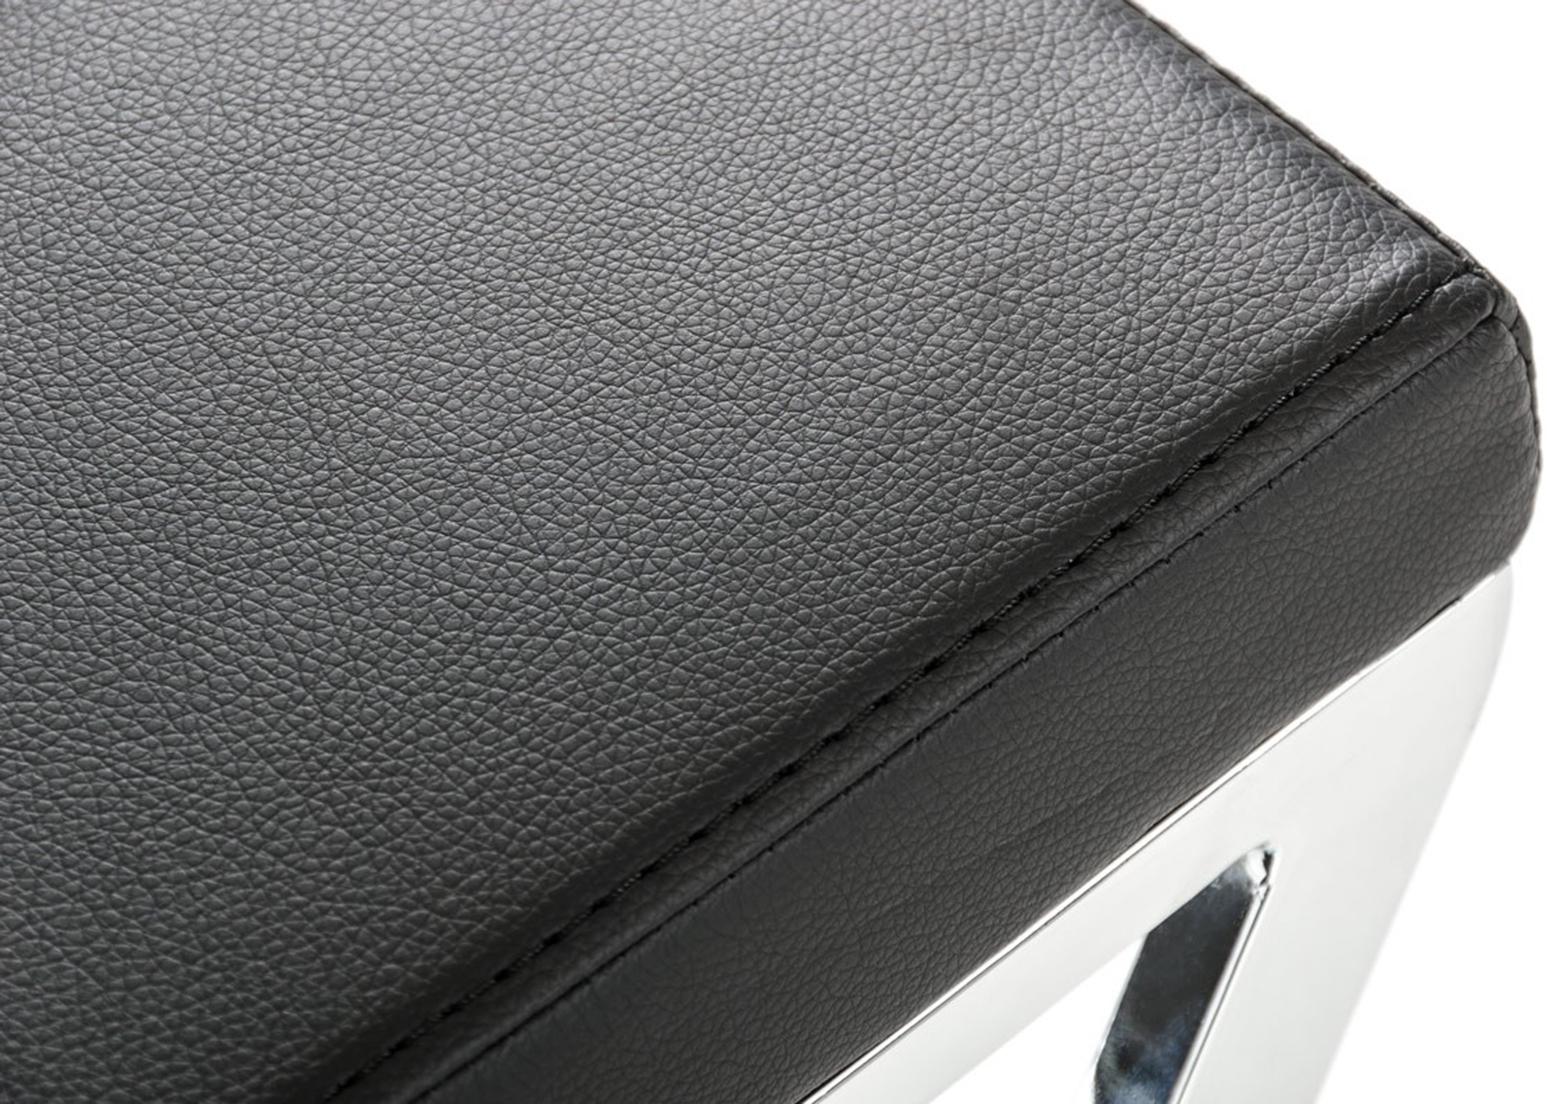 close-up-shot-of-the-bettina-modern-bar-stool-in-black.jpg